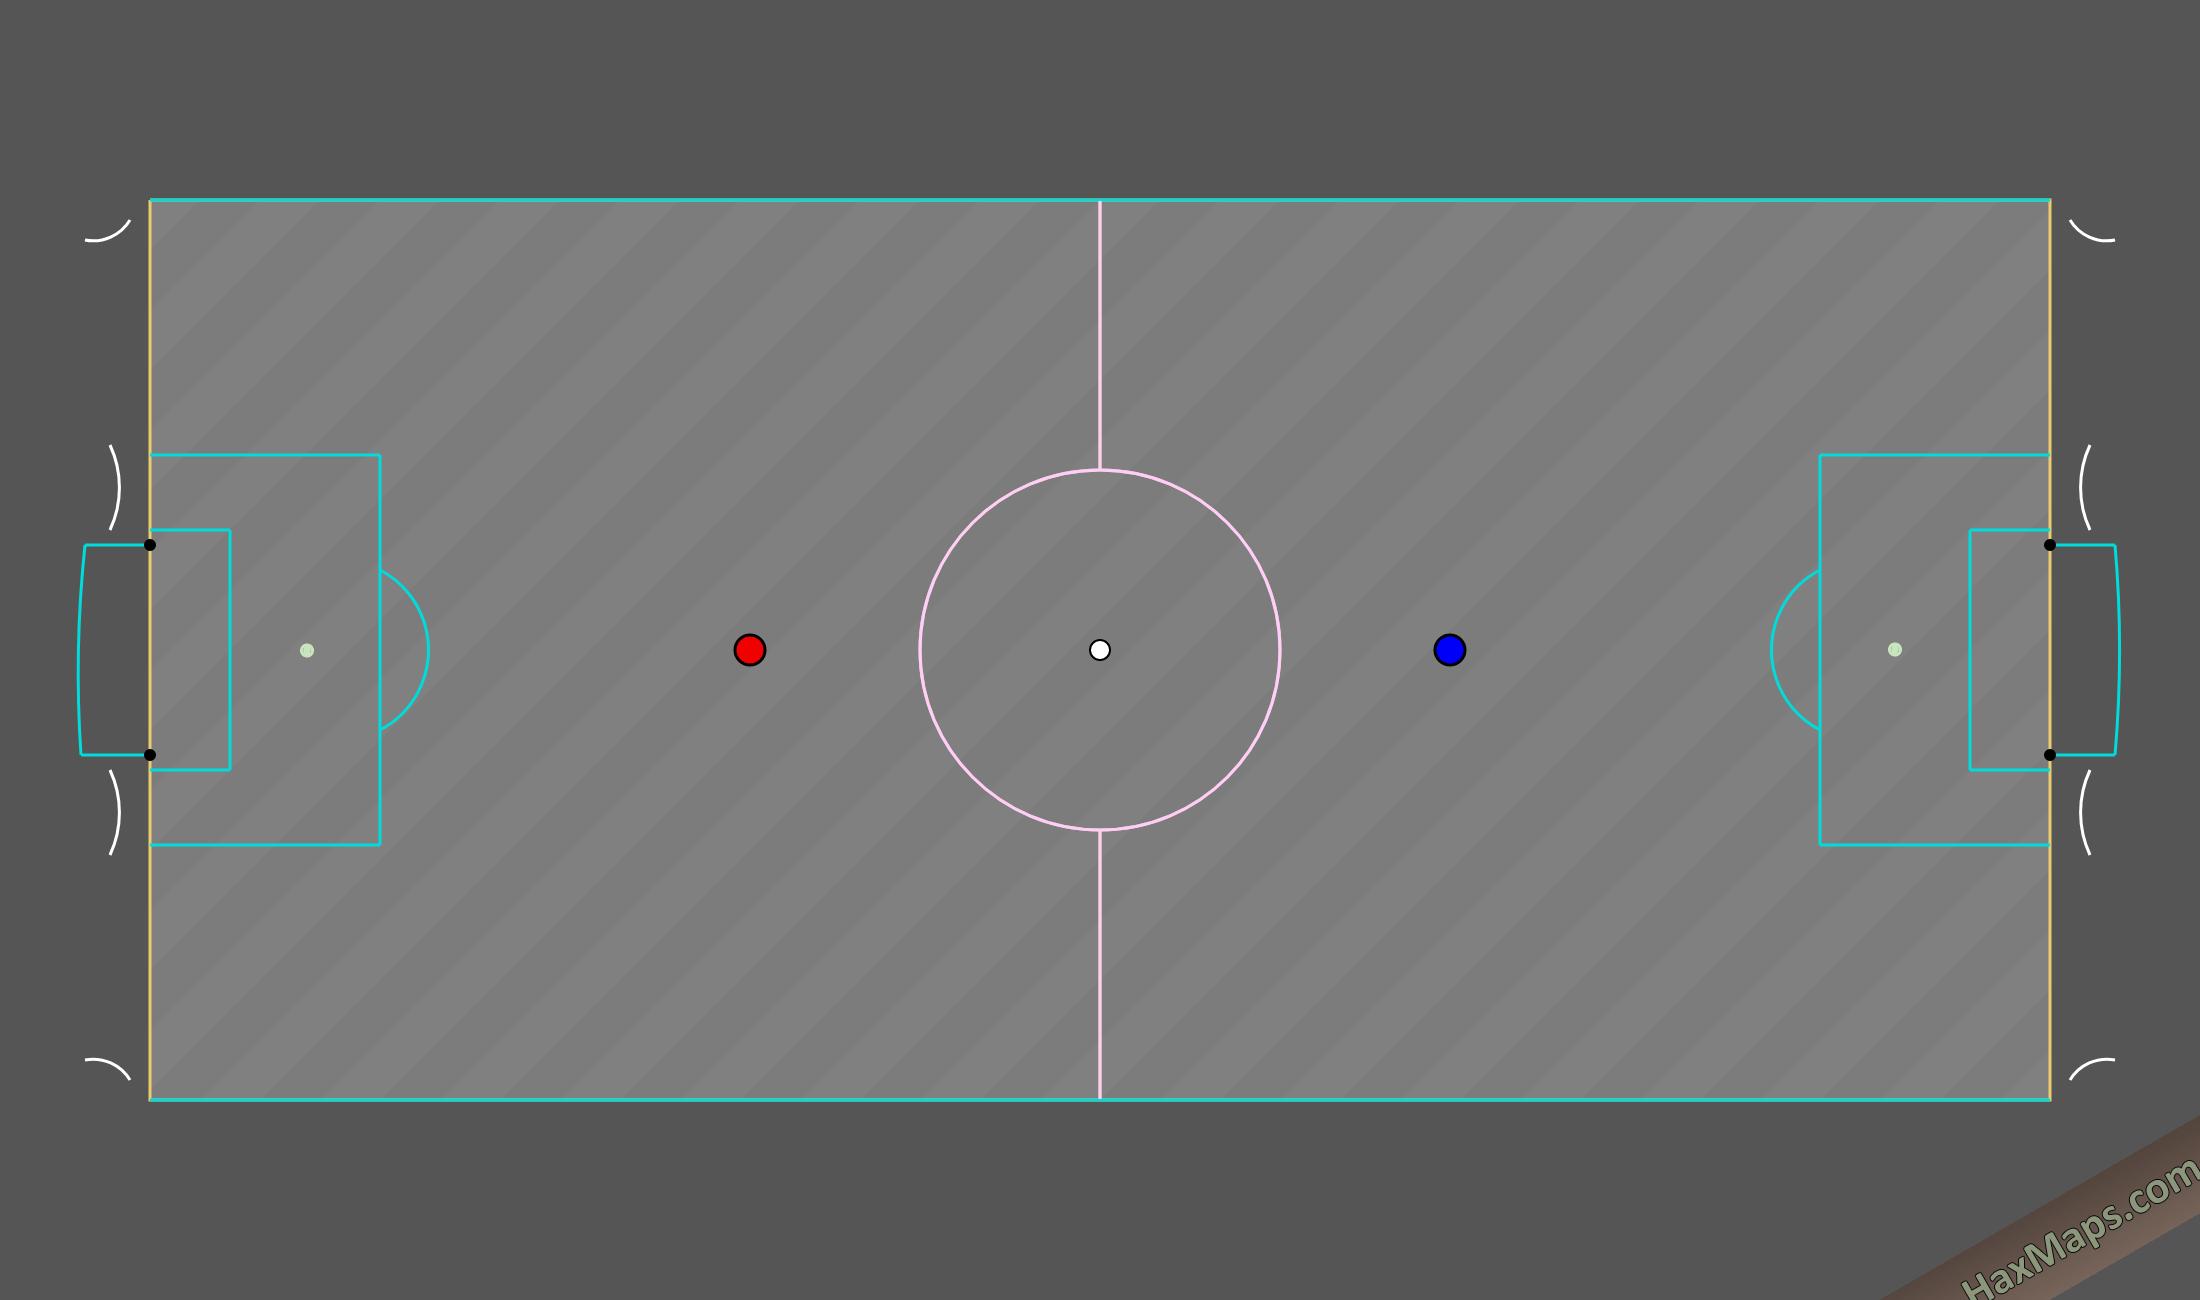 hax ball maps | Duvarlı Real Soccer v1_6